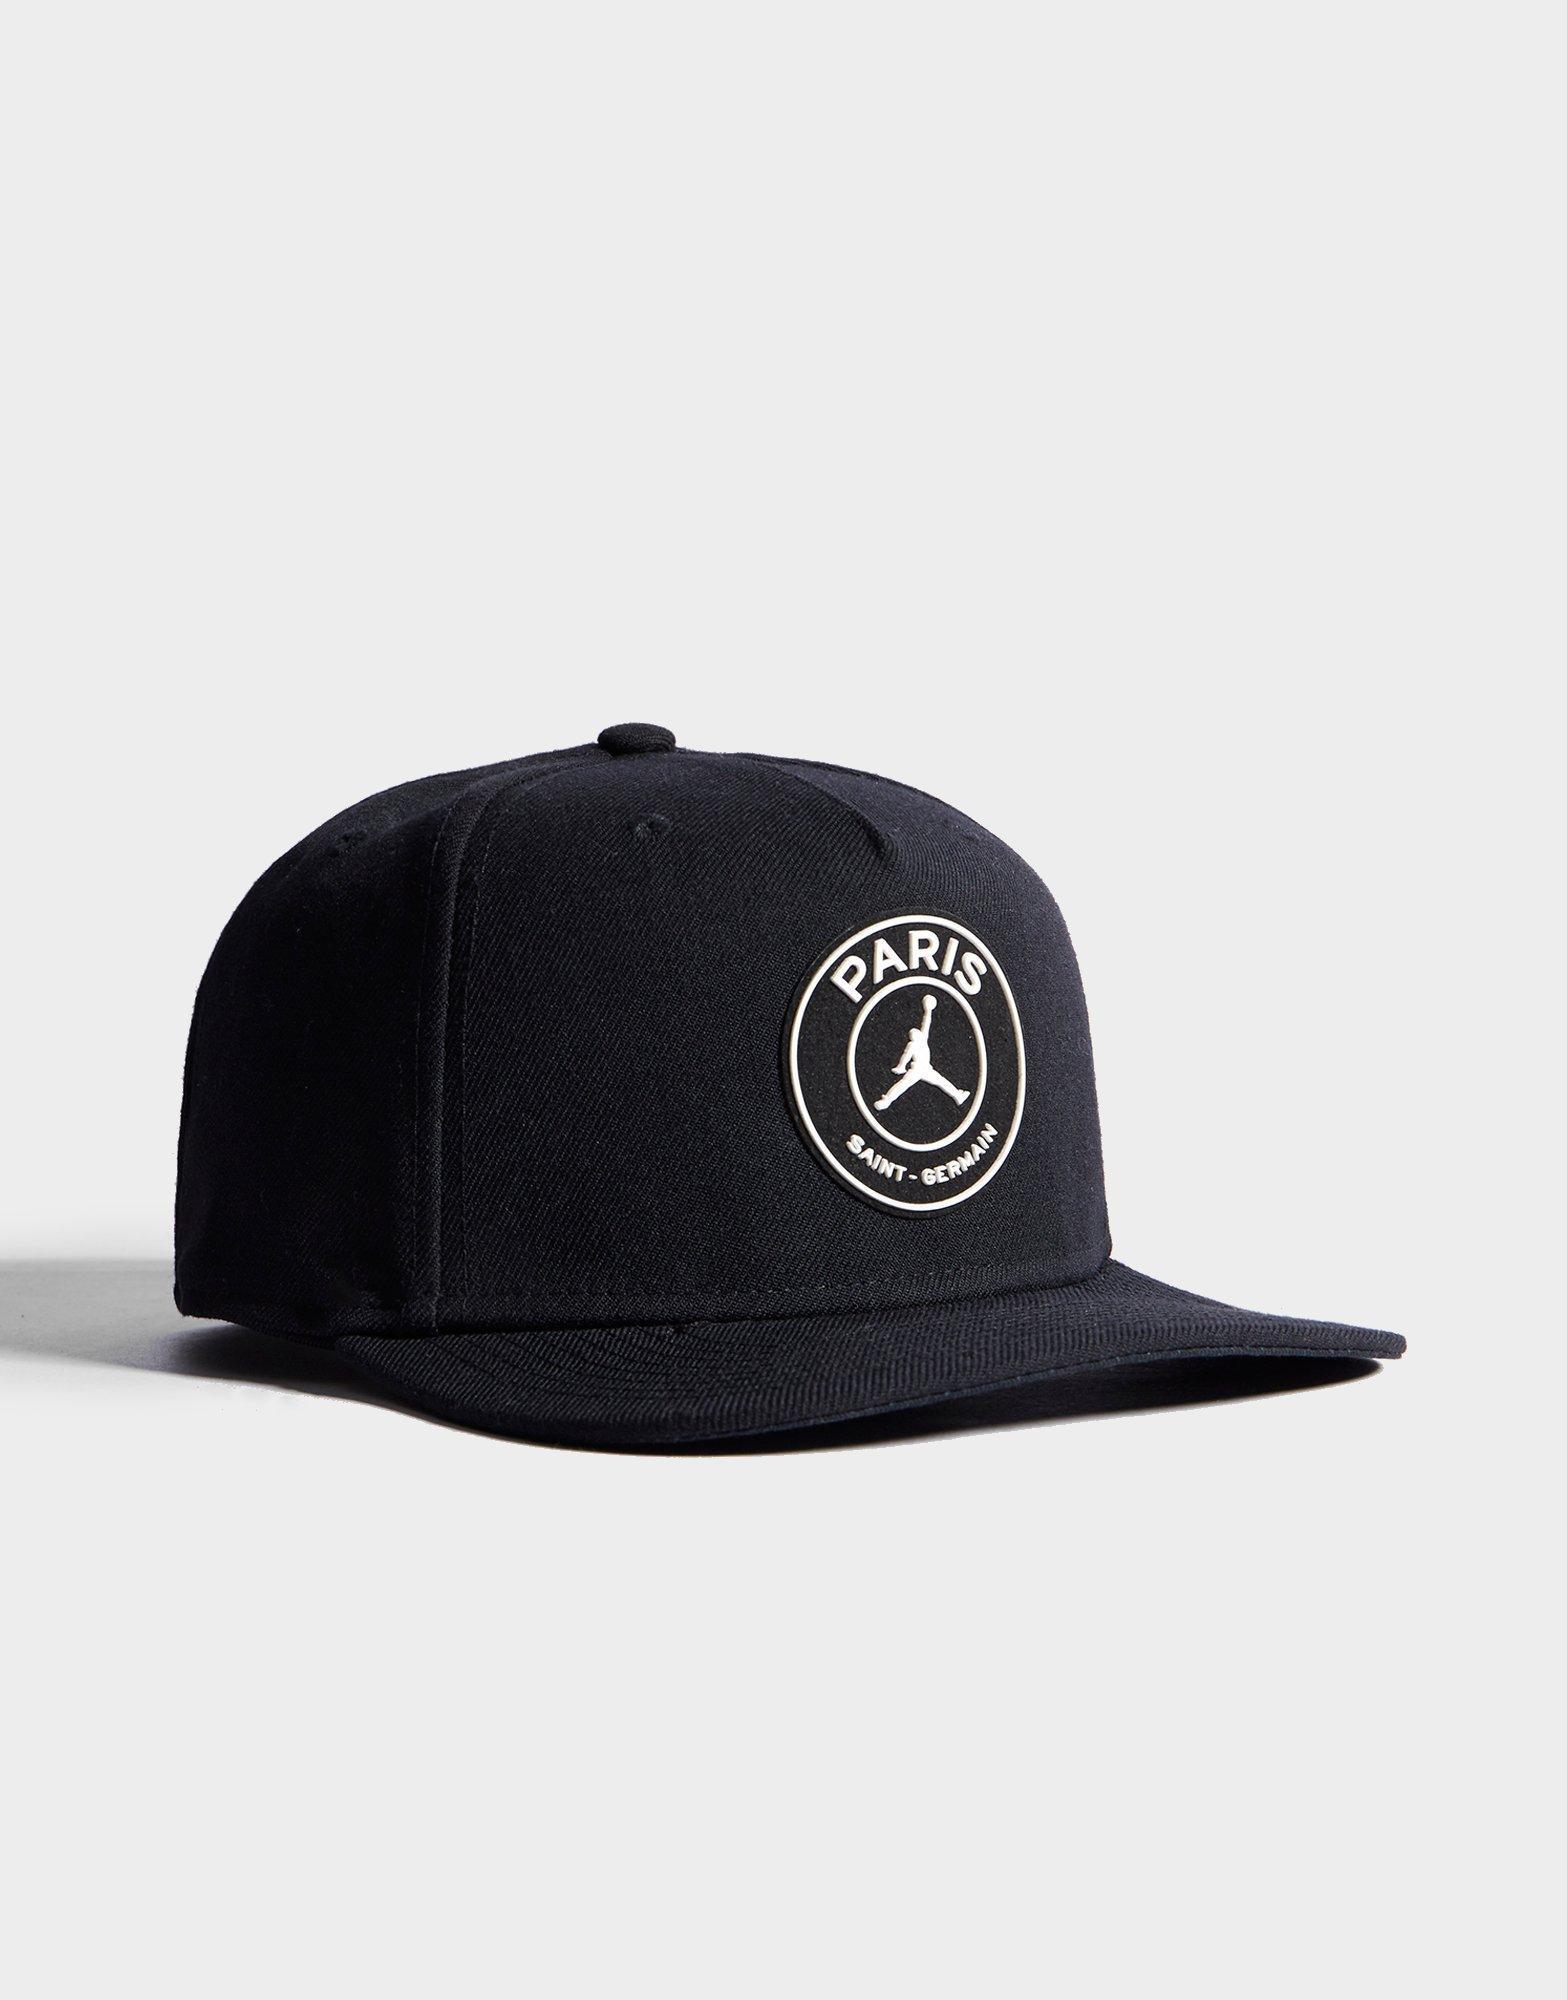 4795f7294 Nike Black X Paris Saint Germain Pro Cap for men